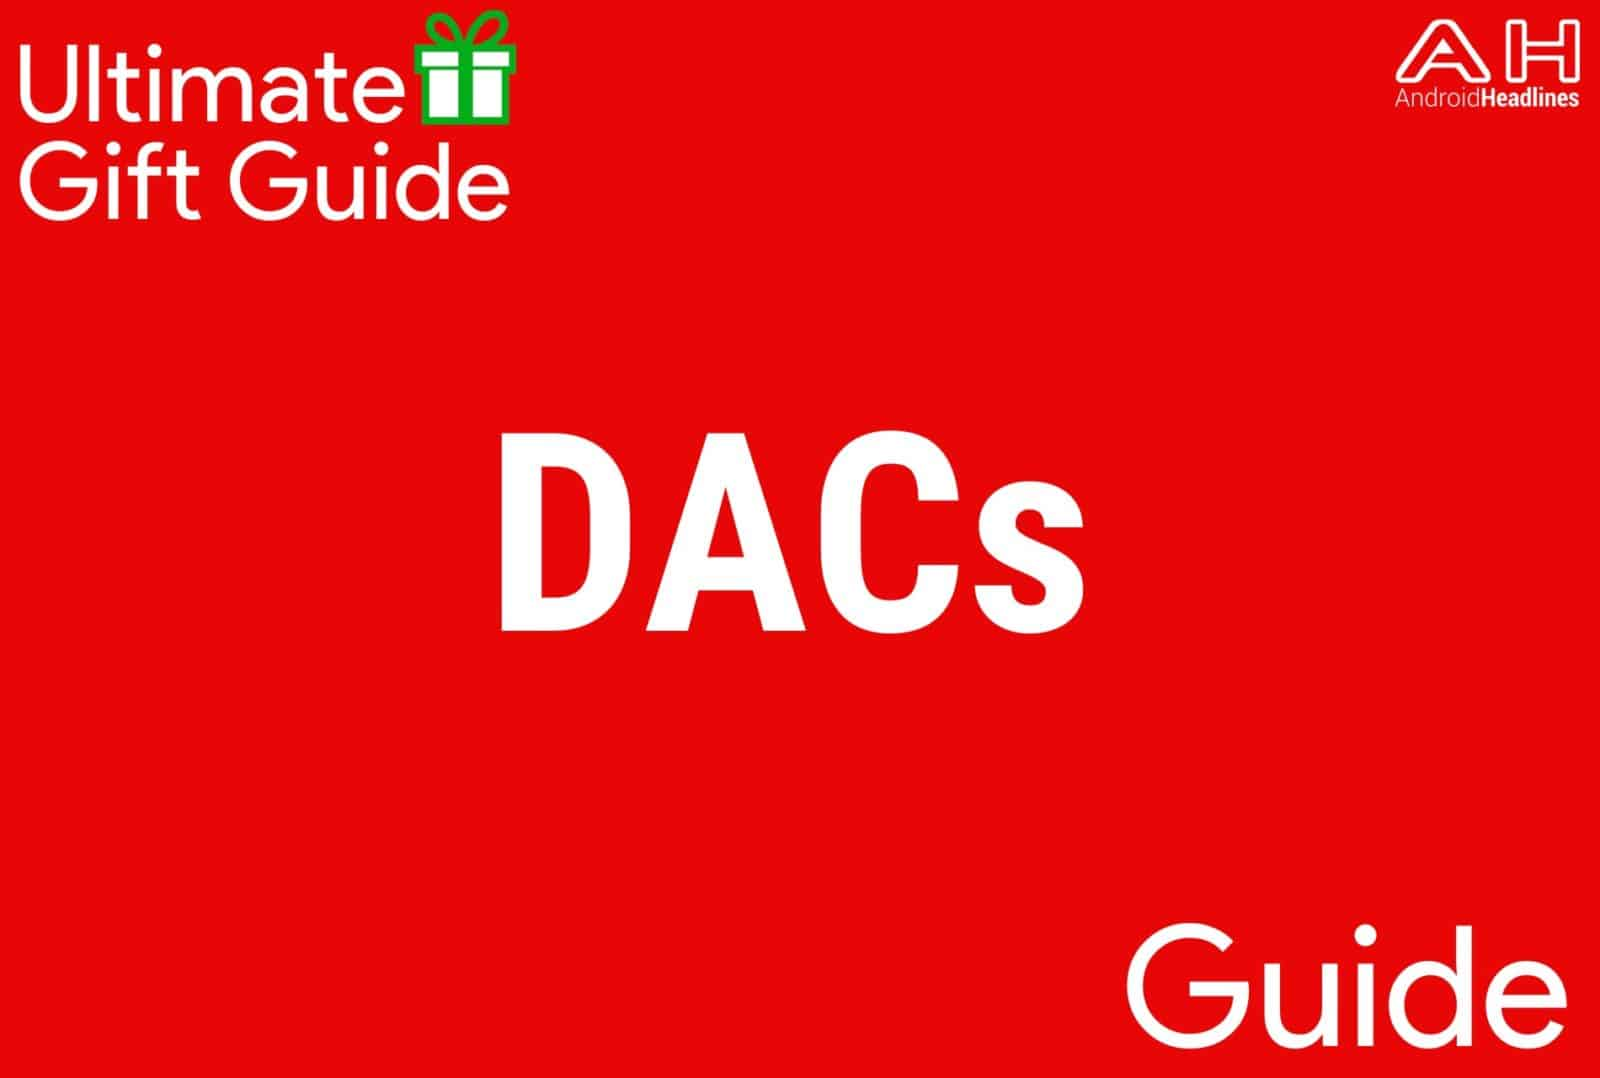 DACs - Gift Guide 2015